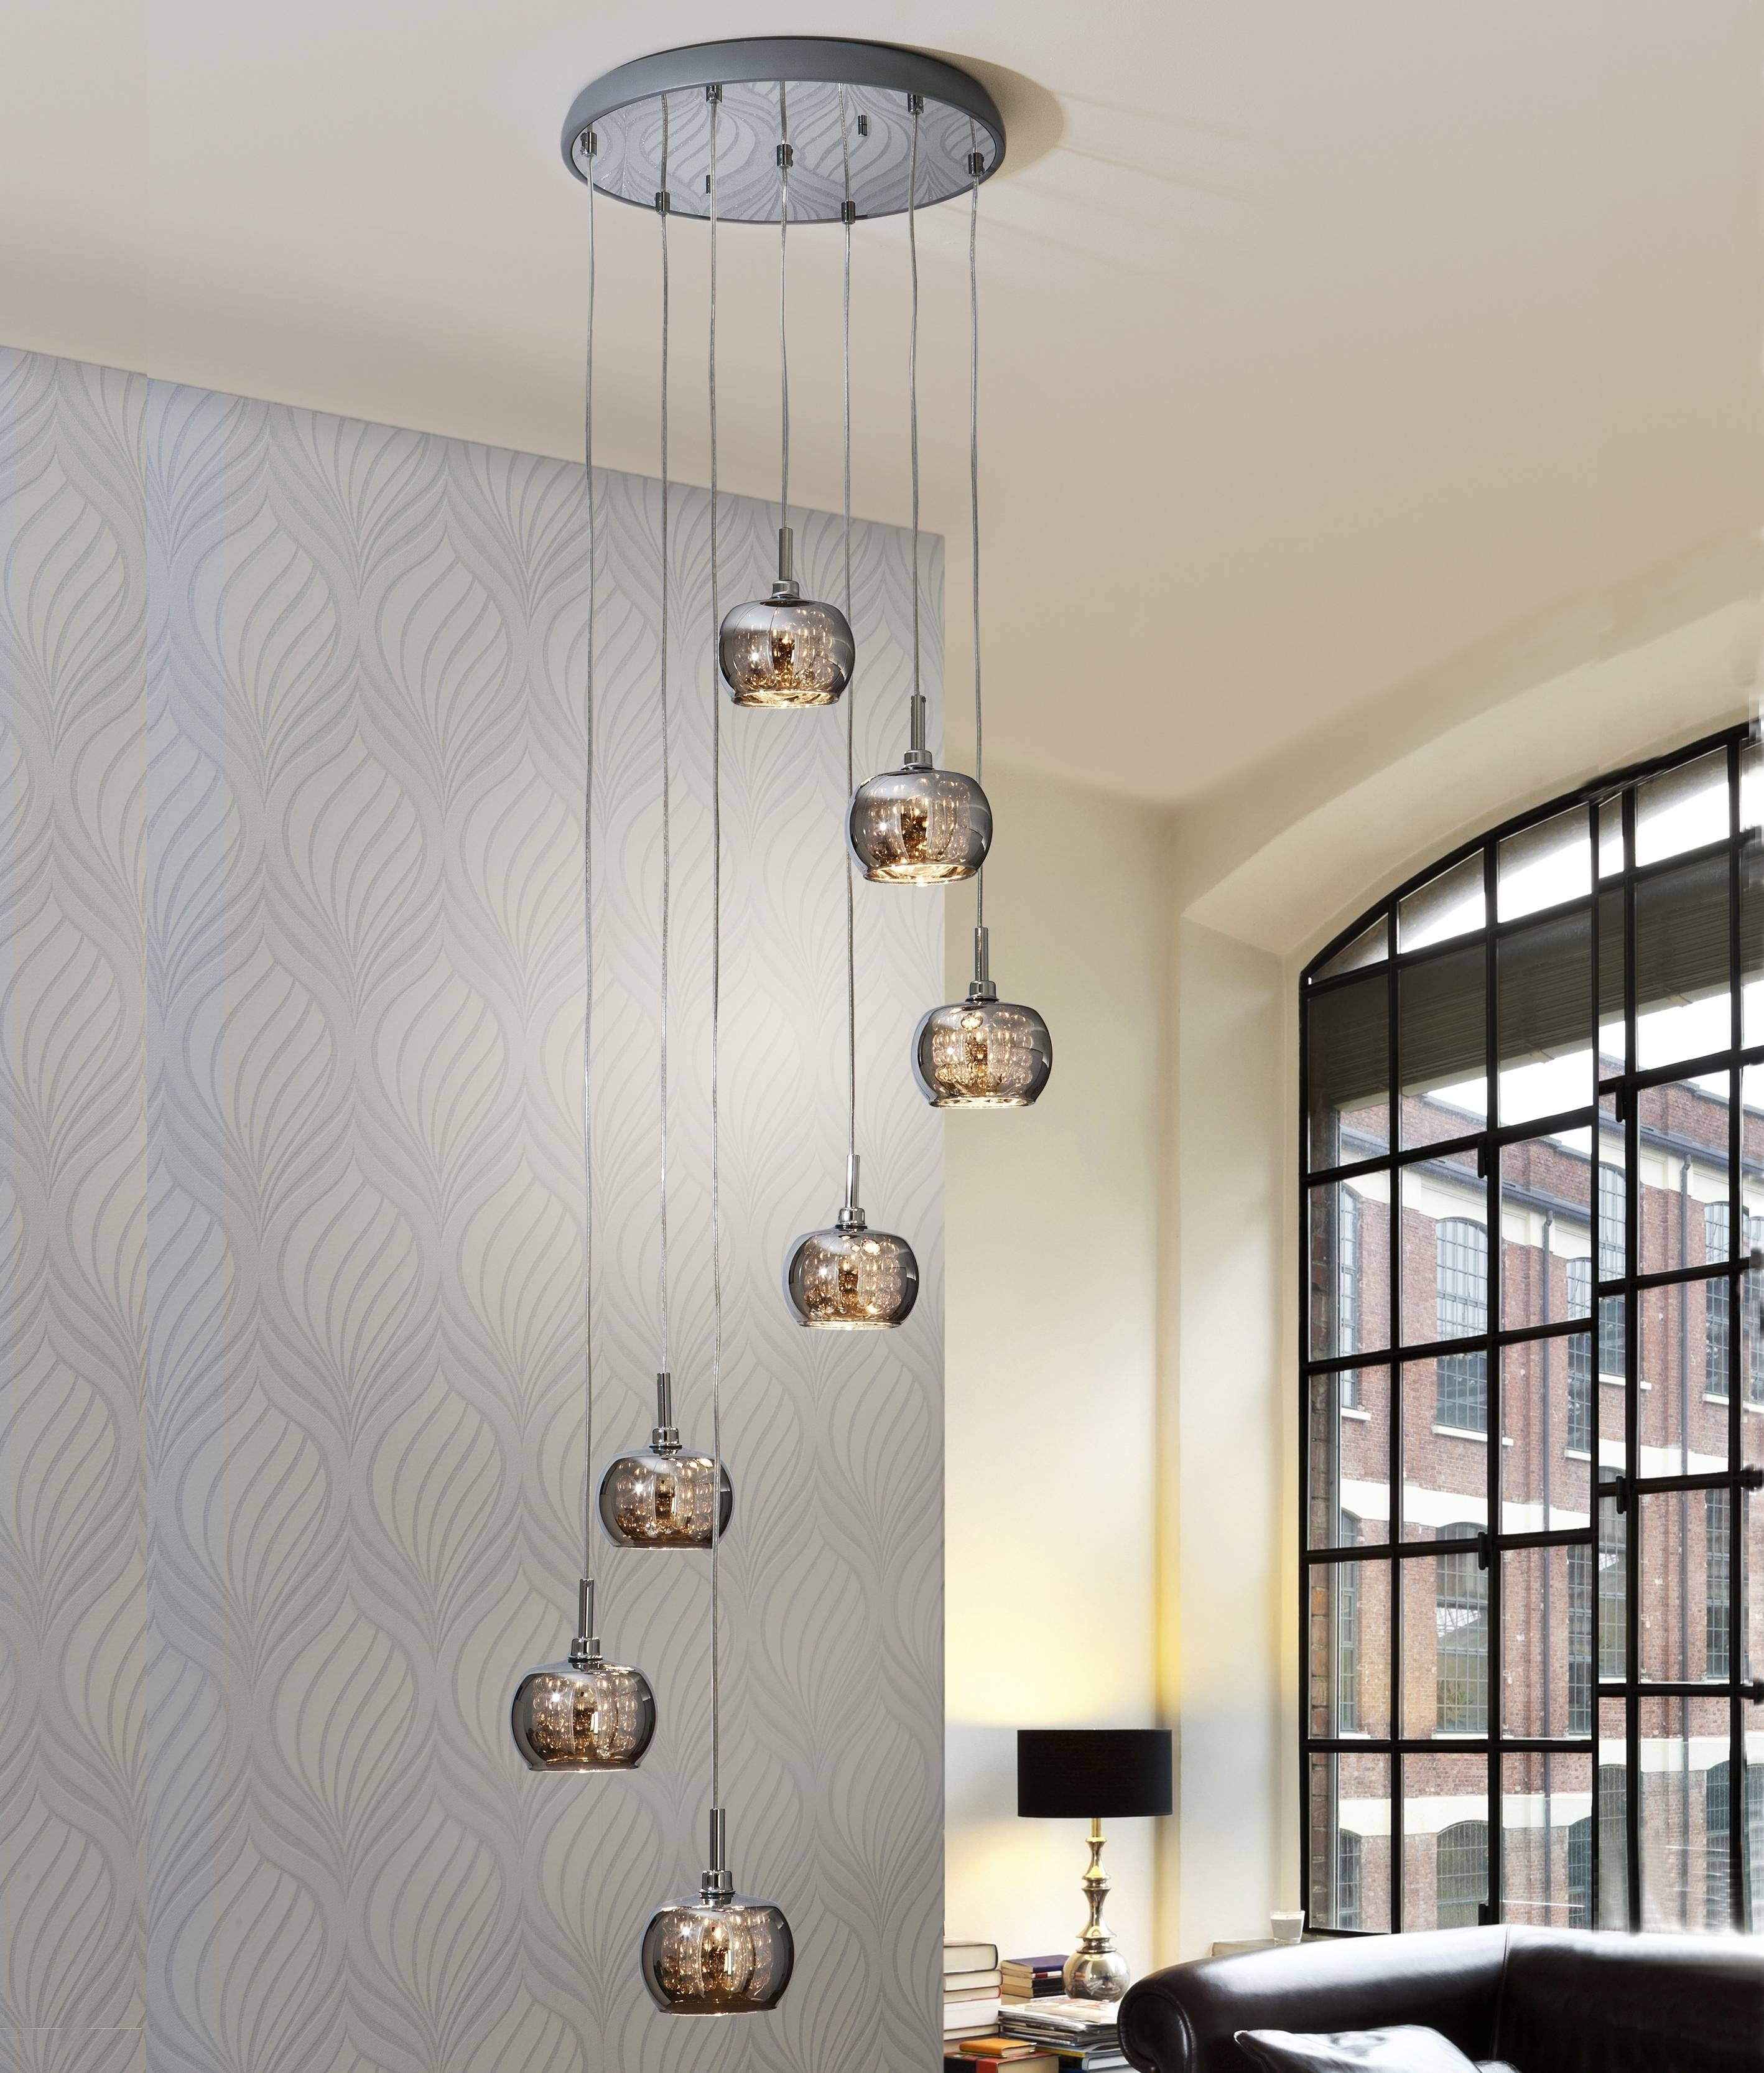 Long Drop Led Smoked Glass Pendant Pertaining To Long Pendant Lighting (View 8 of 15)